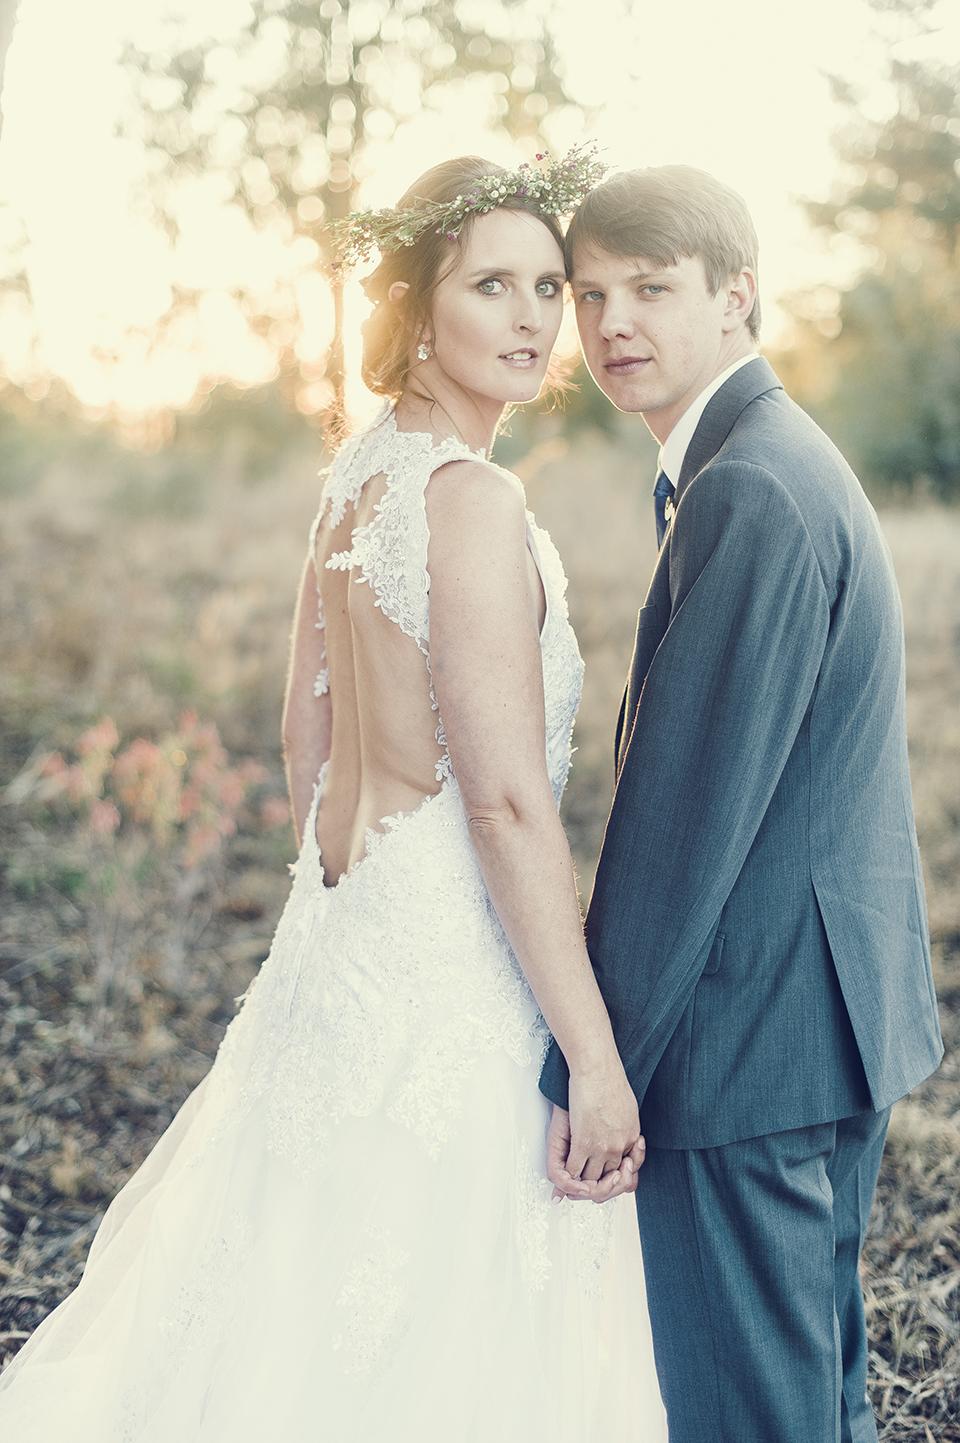 RyanParker_WeddingPhotographer_Pretoria_RosemaryHill_Gauteng_P&R_DSC_6963.jpg